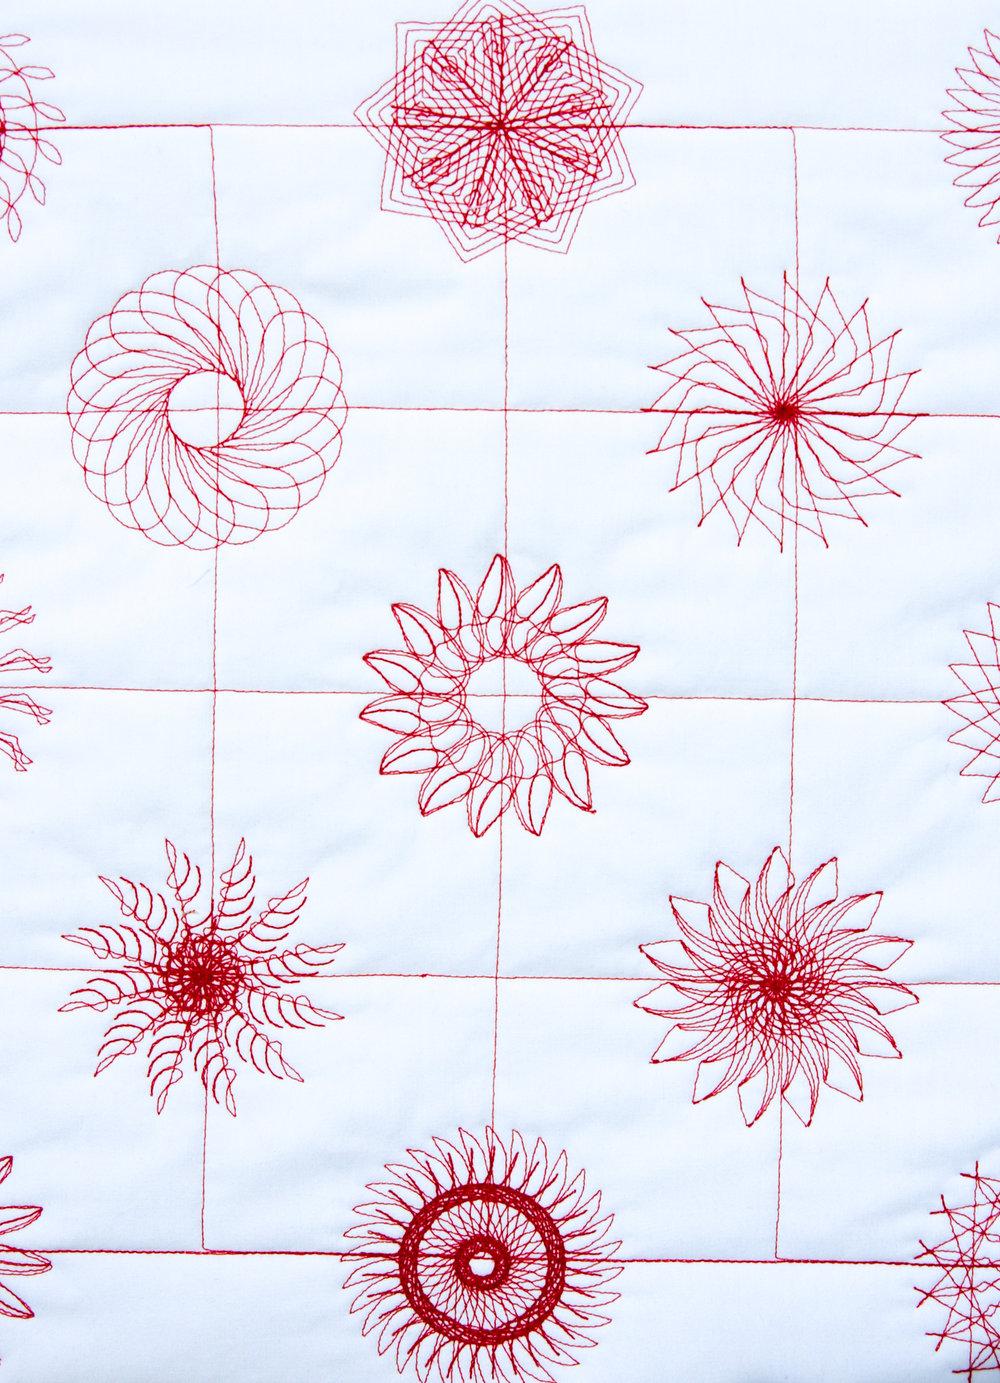 M.Munro-MRROS-2017-stitched-digital-designs.jpg